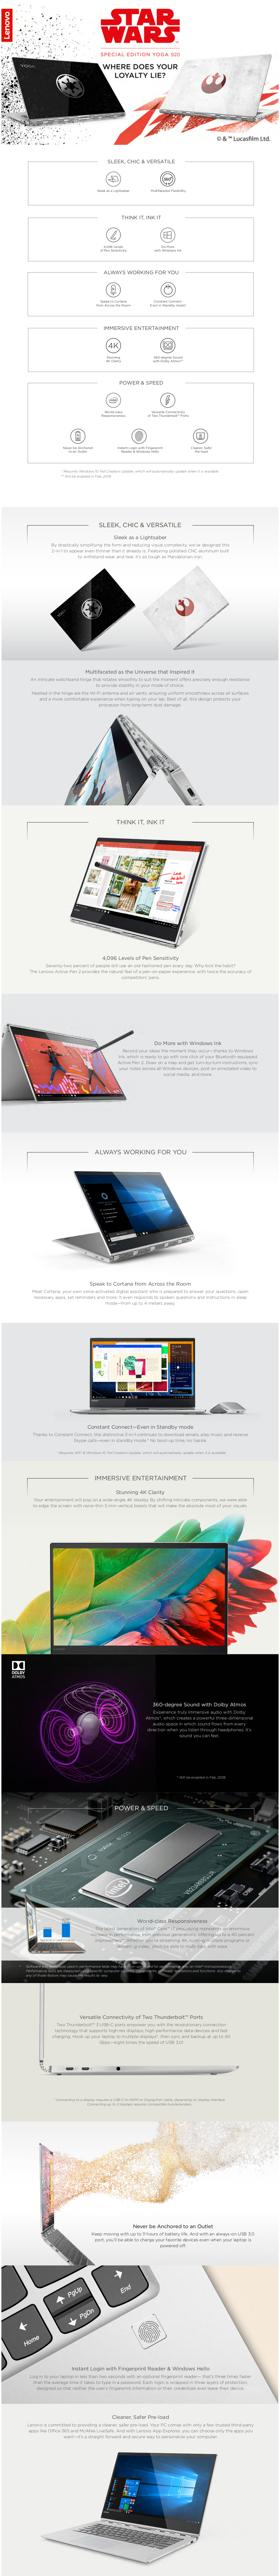 Lenovo Yoga 920-13IKB Star Wars - 80Y8001NSB (Intel i7, 16GB RAM, 512SSD)